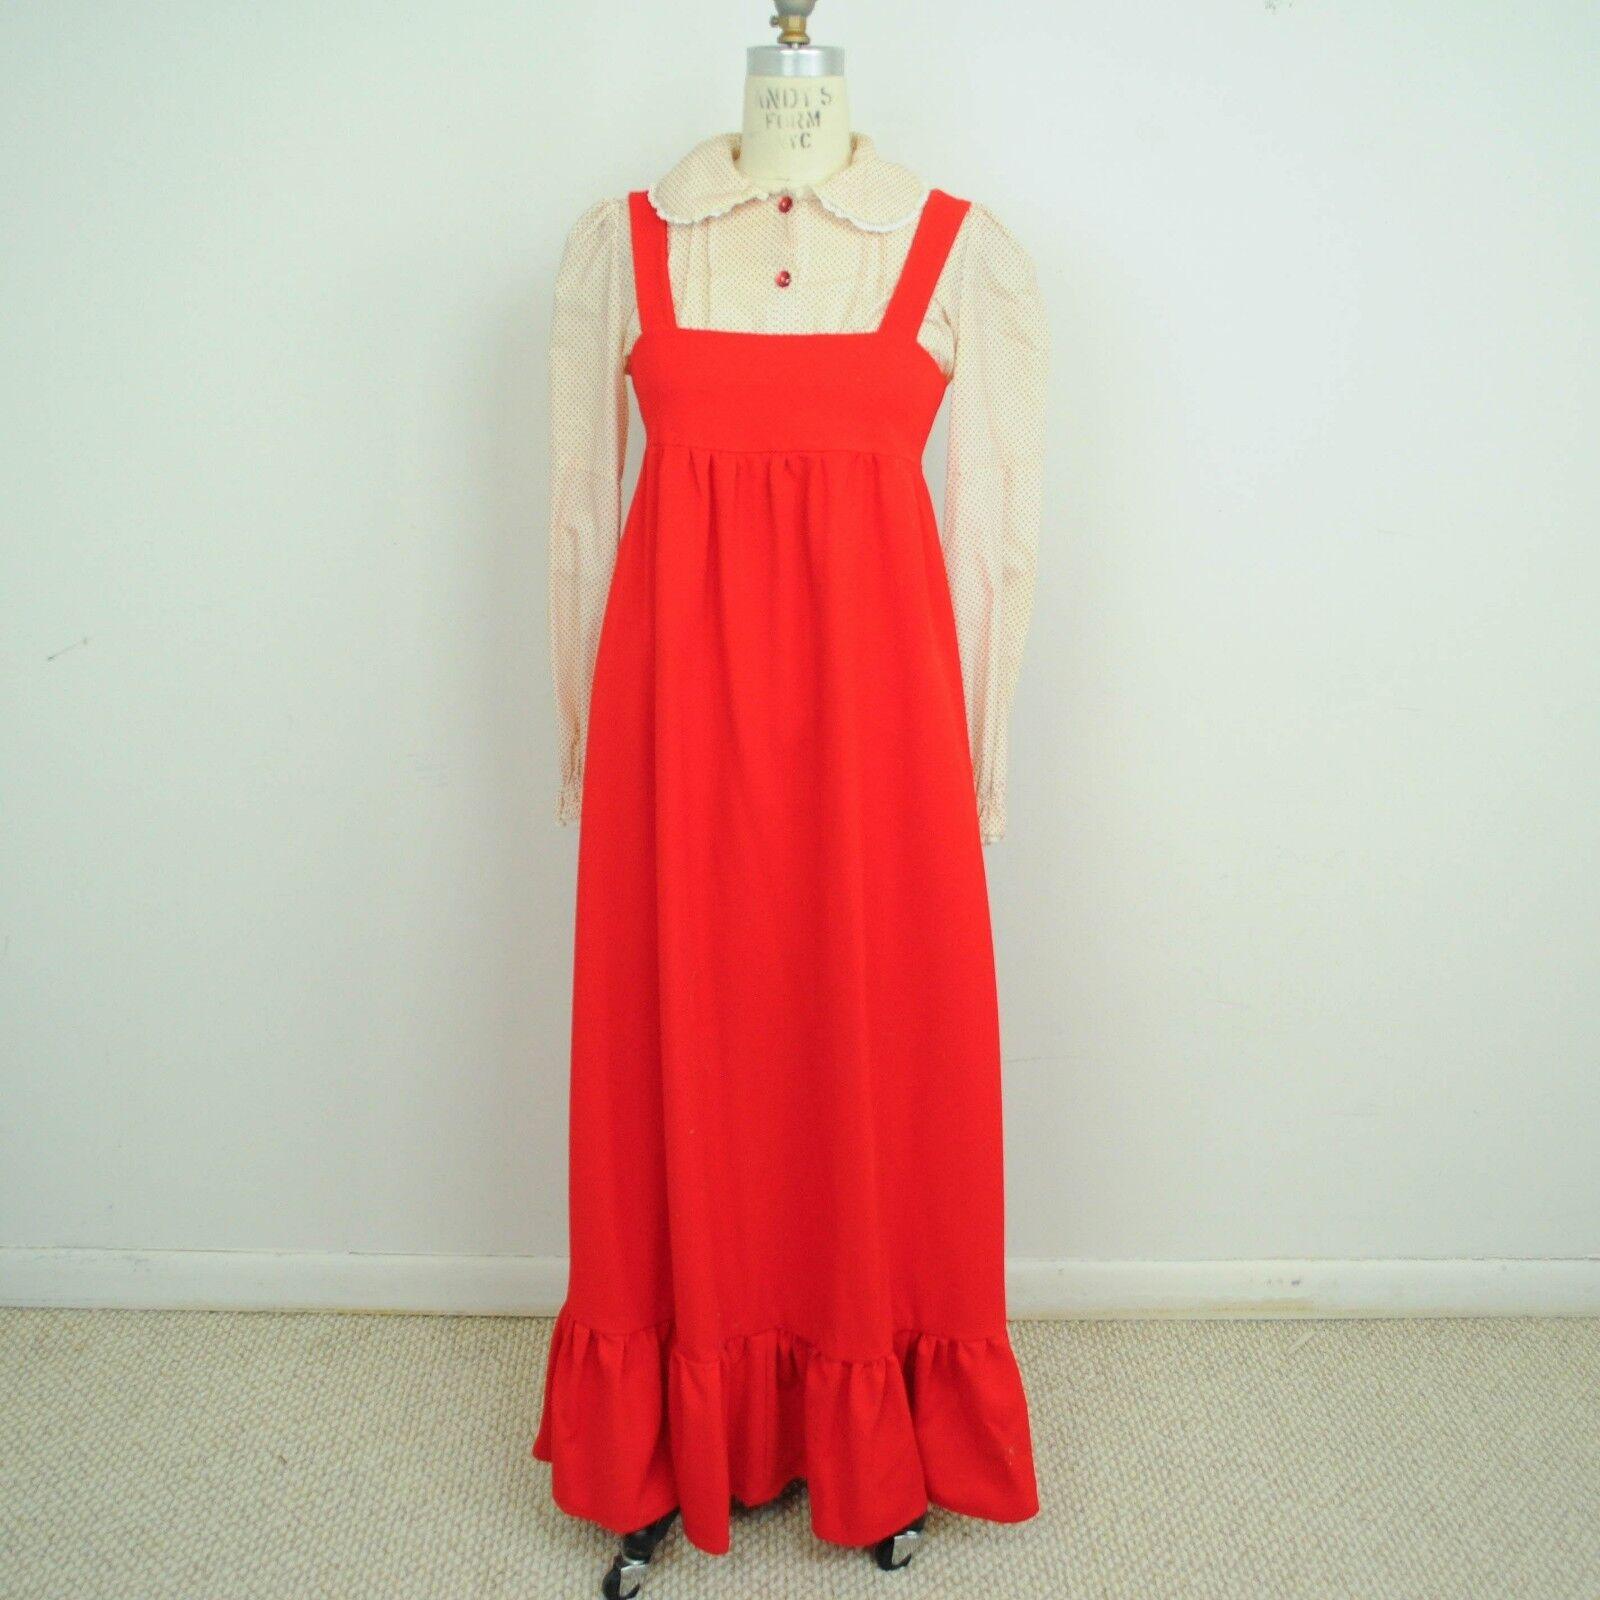 VTG 60s 70s Womens Pinafore Maxi Dress Polka Dot Blouse Sz XS S Red White D24